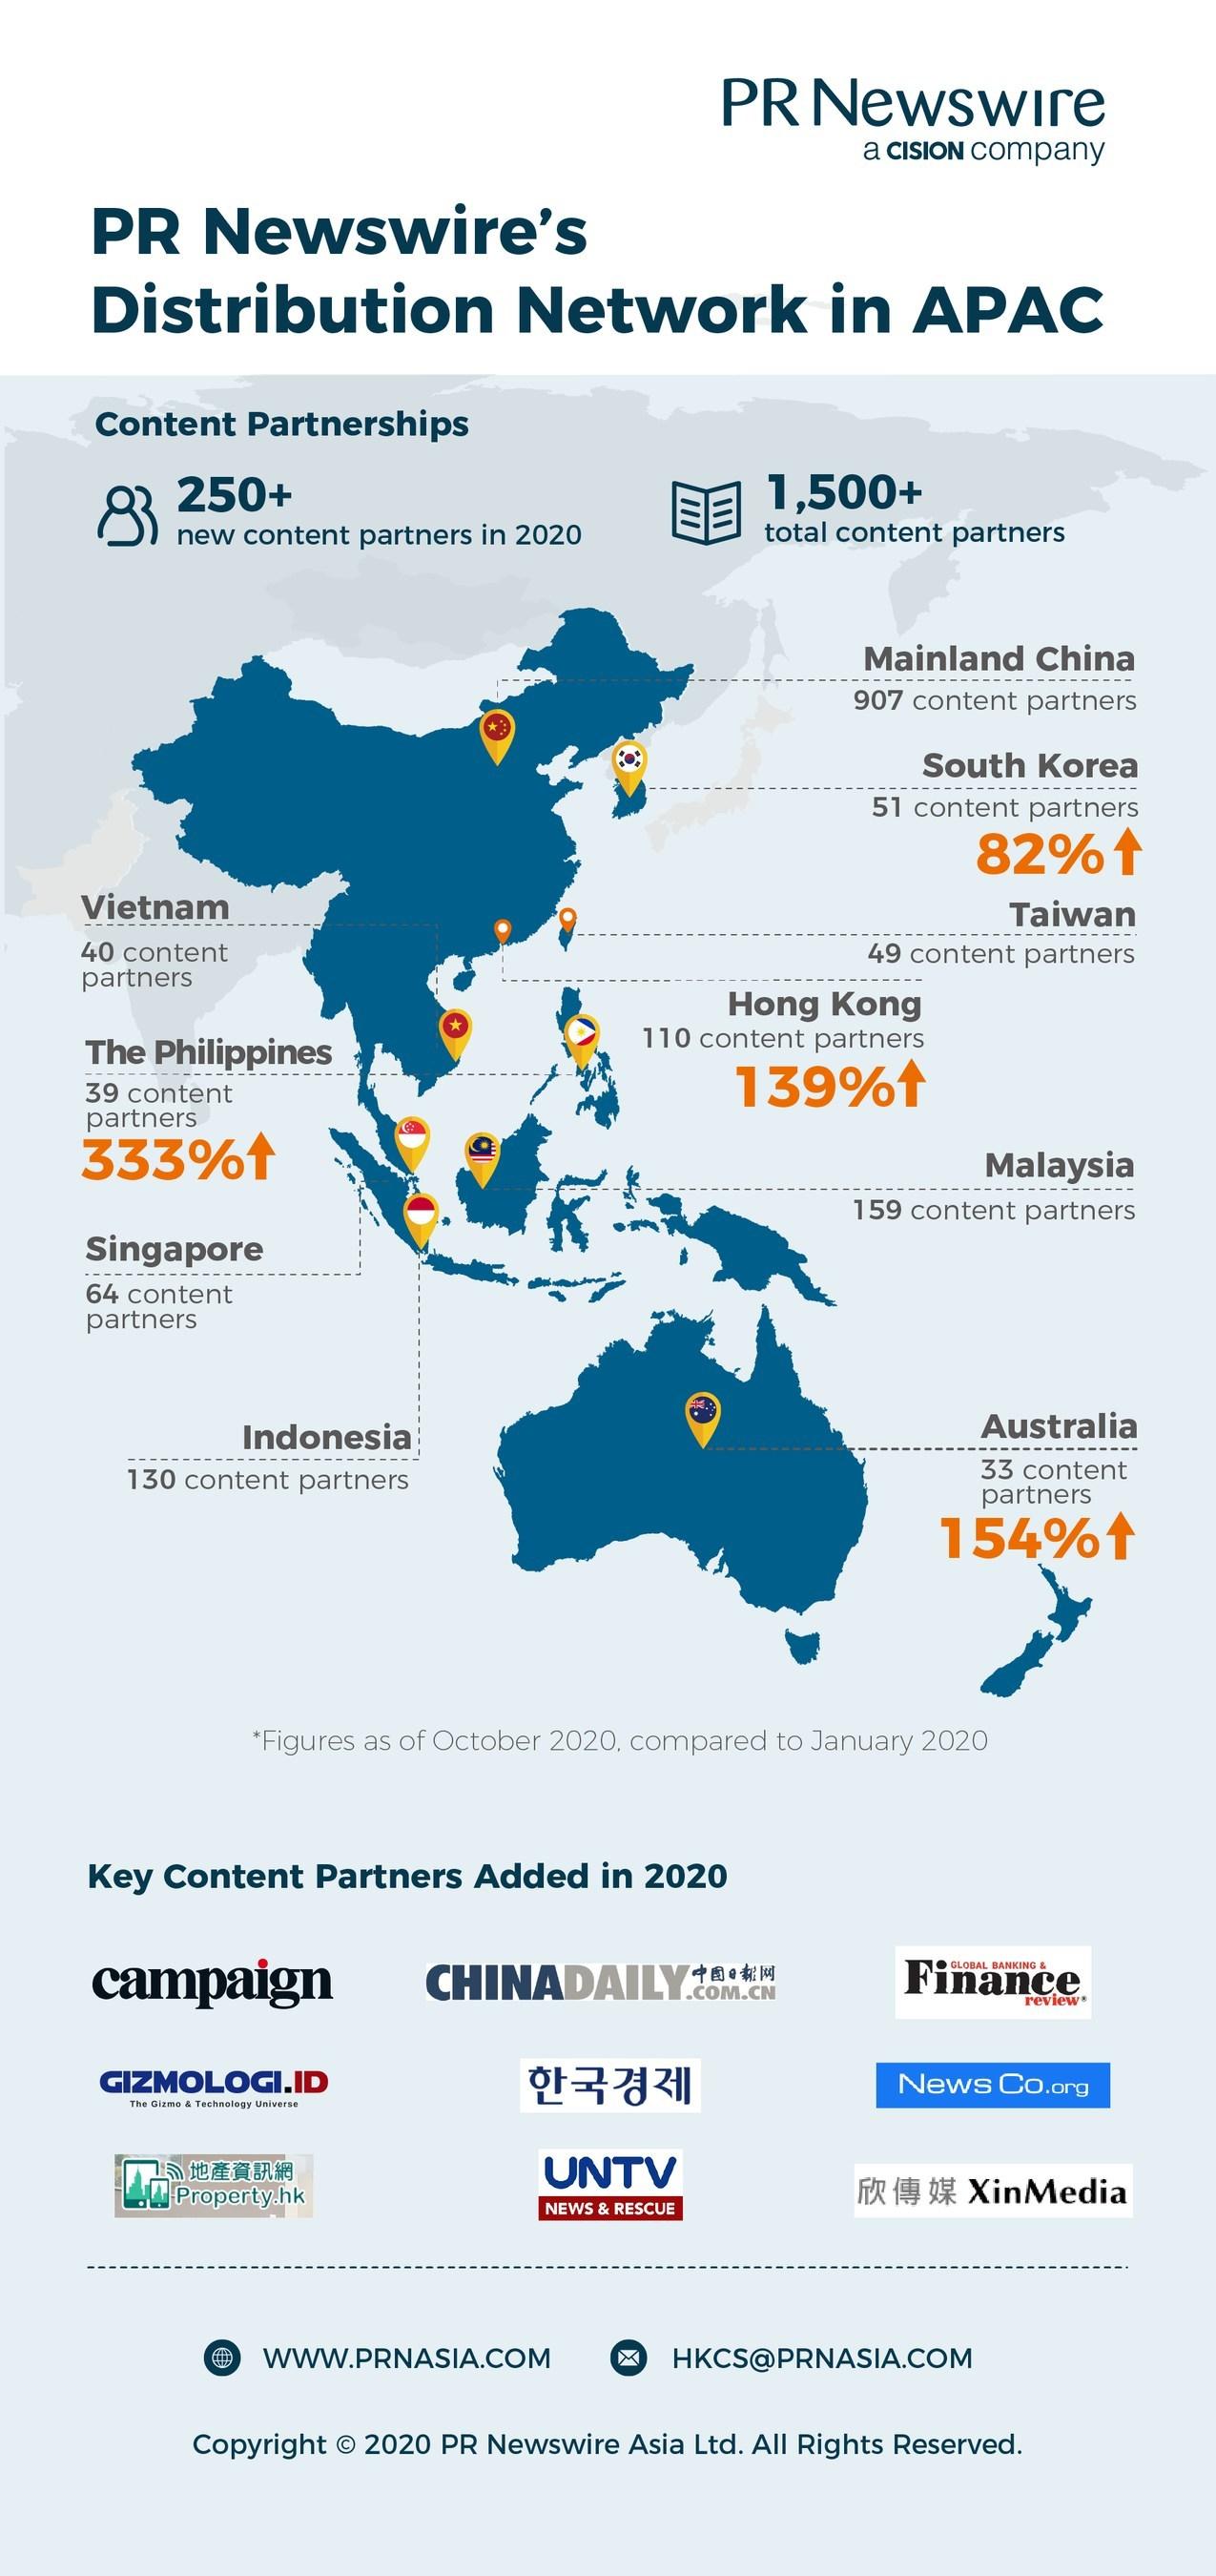 PR Newswire's Distribution Network in APAC 2020